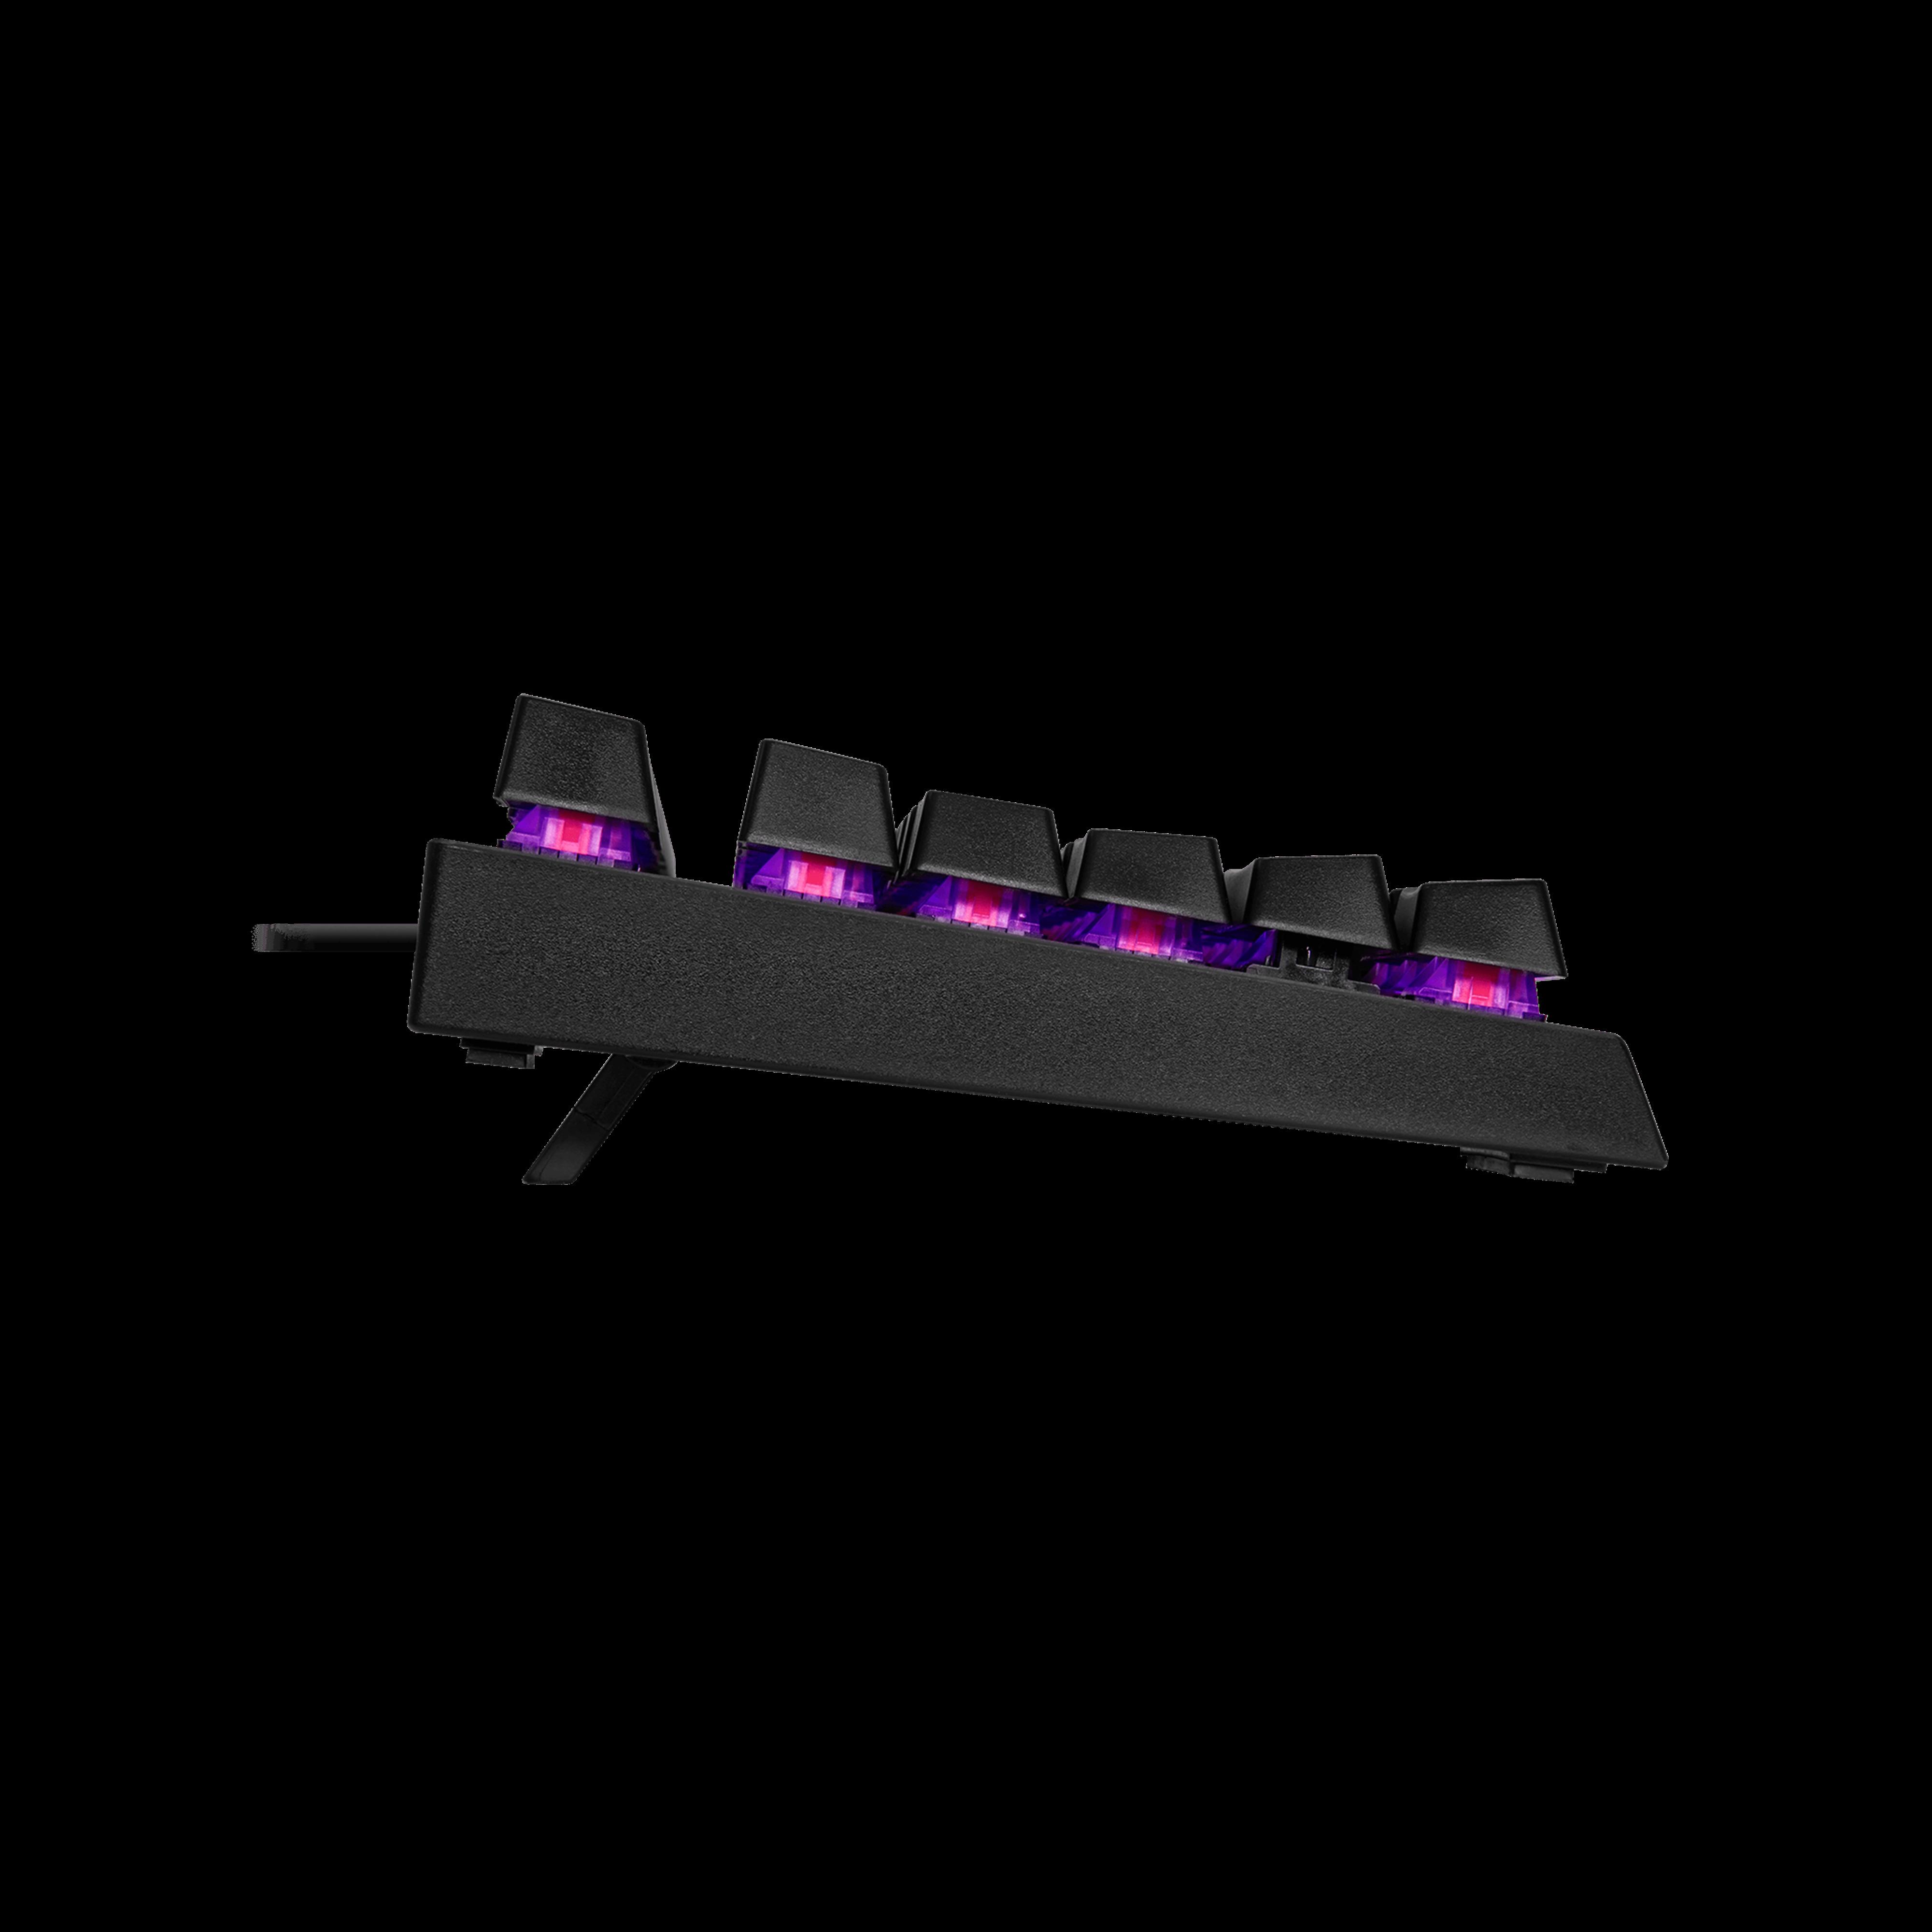 Cooler Master CK351 光軸機械式 RGB 電競鍵盤